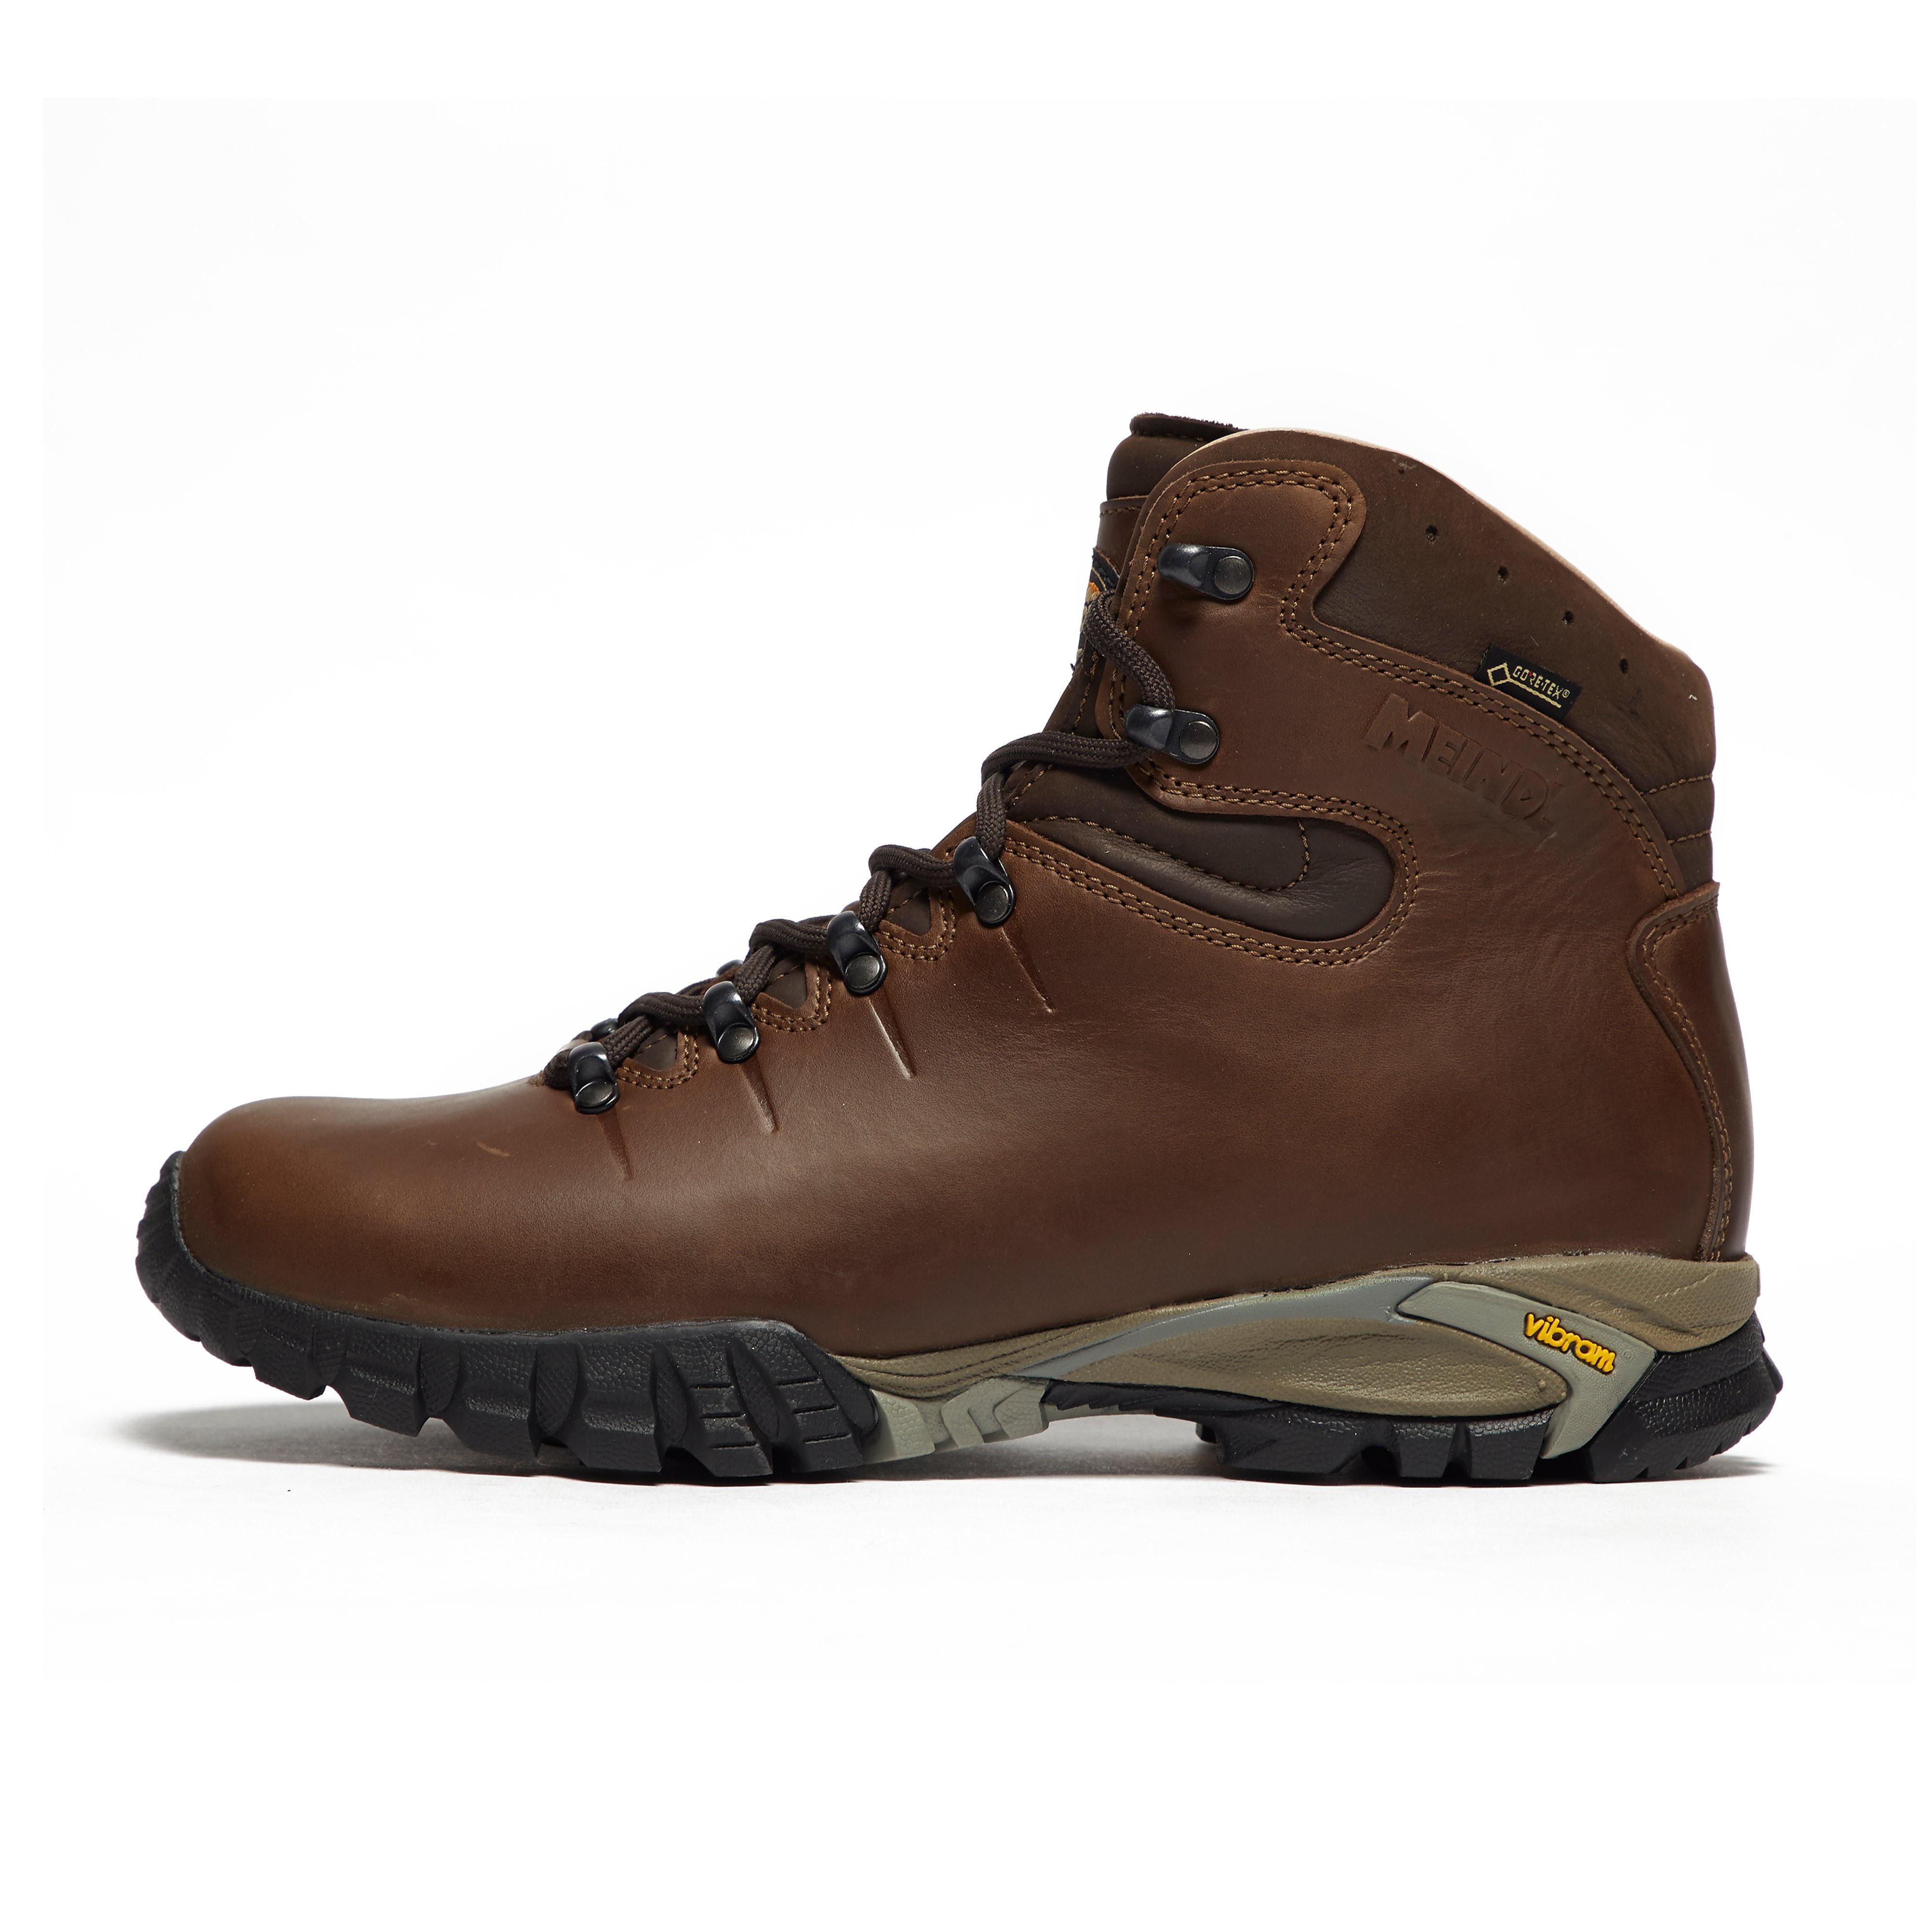 MEINDL TORONTO GTX Men's Walking Boots